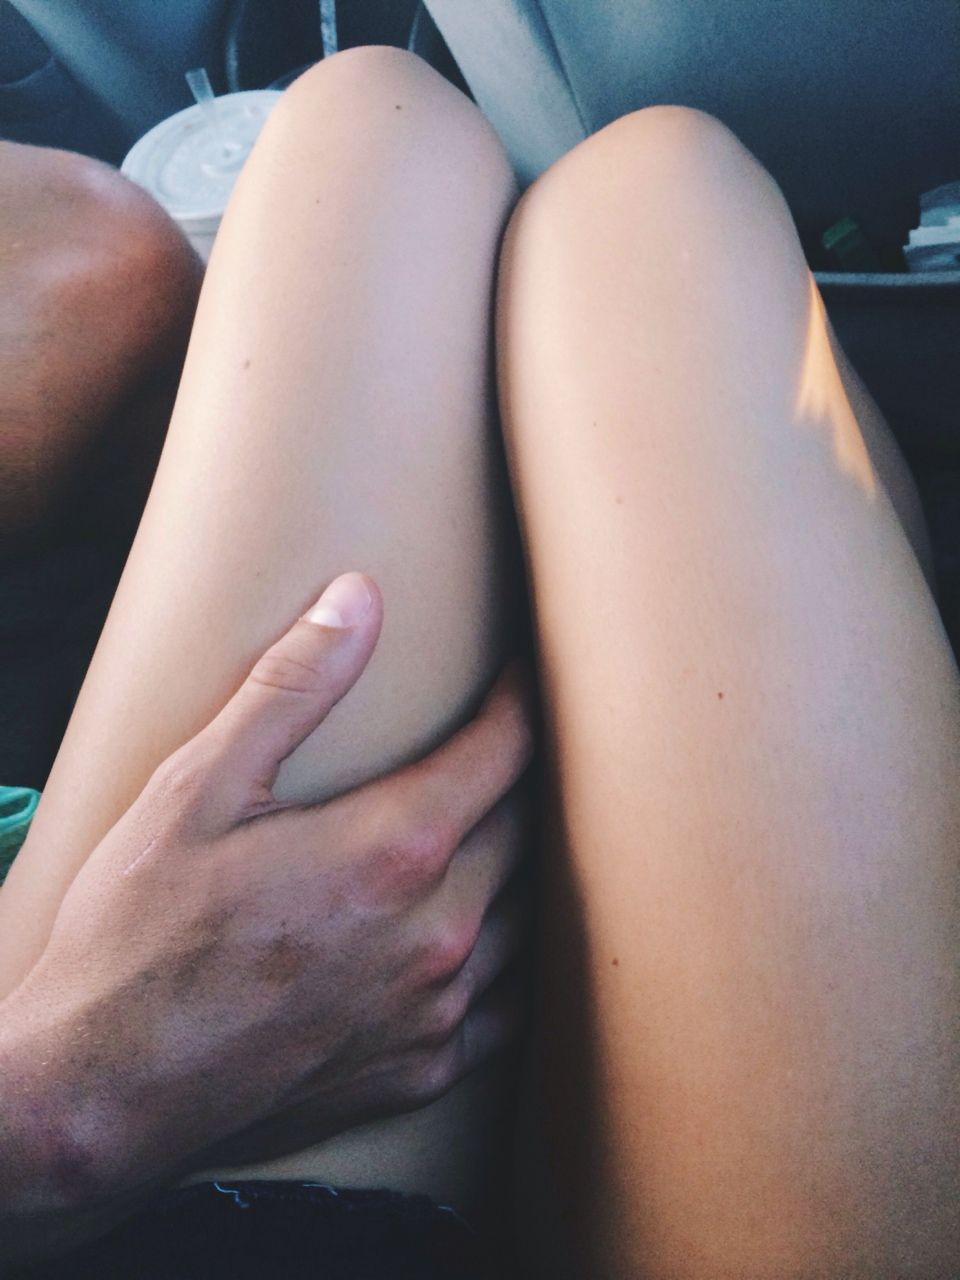 Relationship Goal | relationship | Pinterest | Relationships, Goal ...